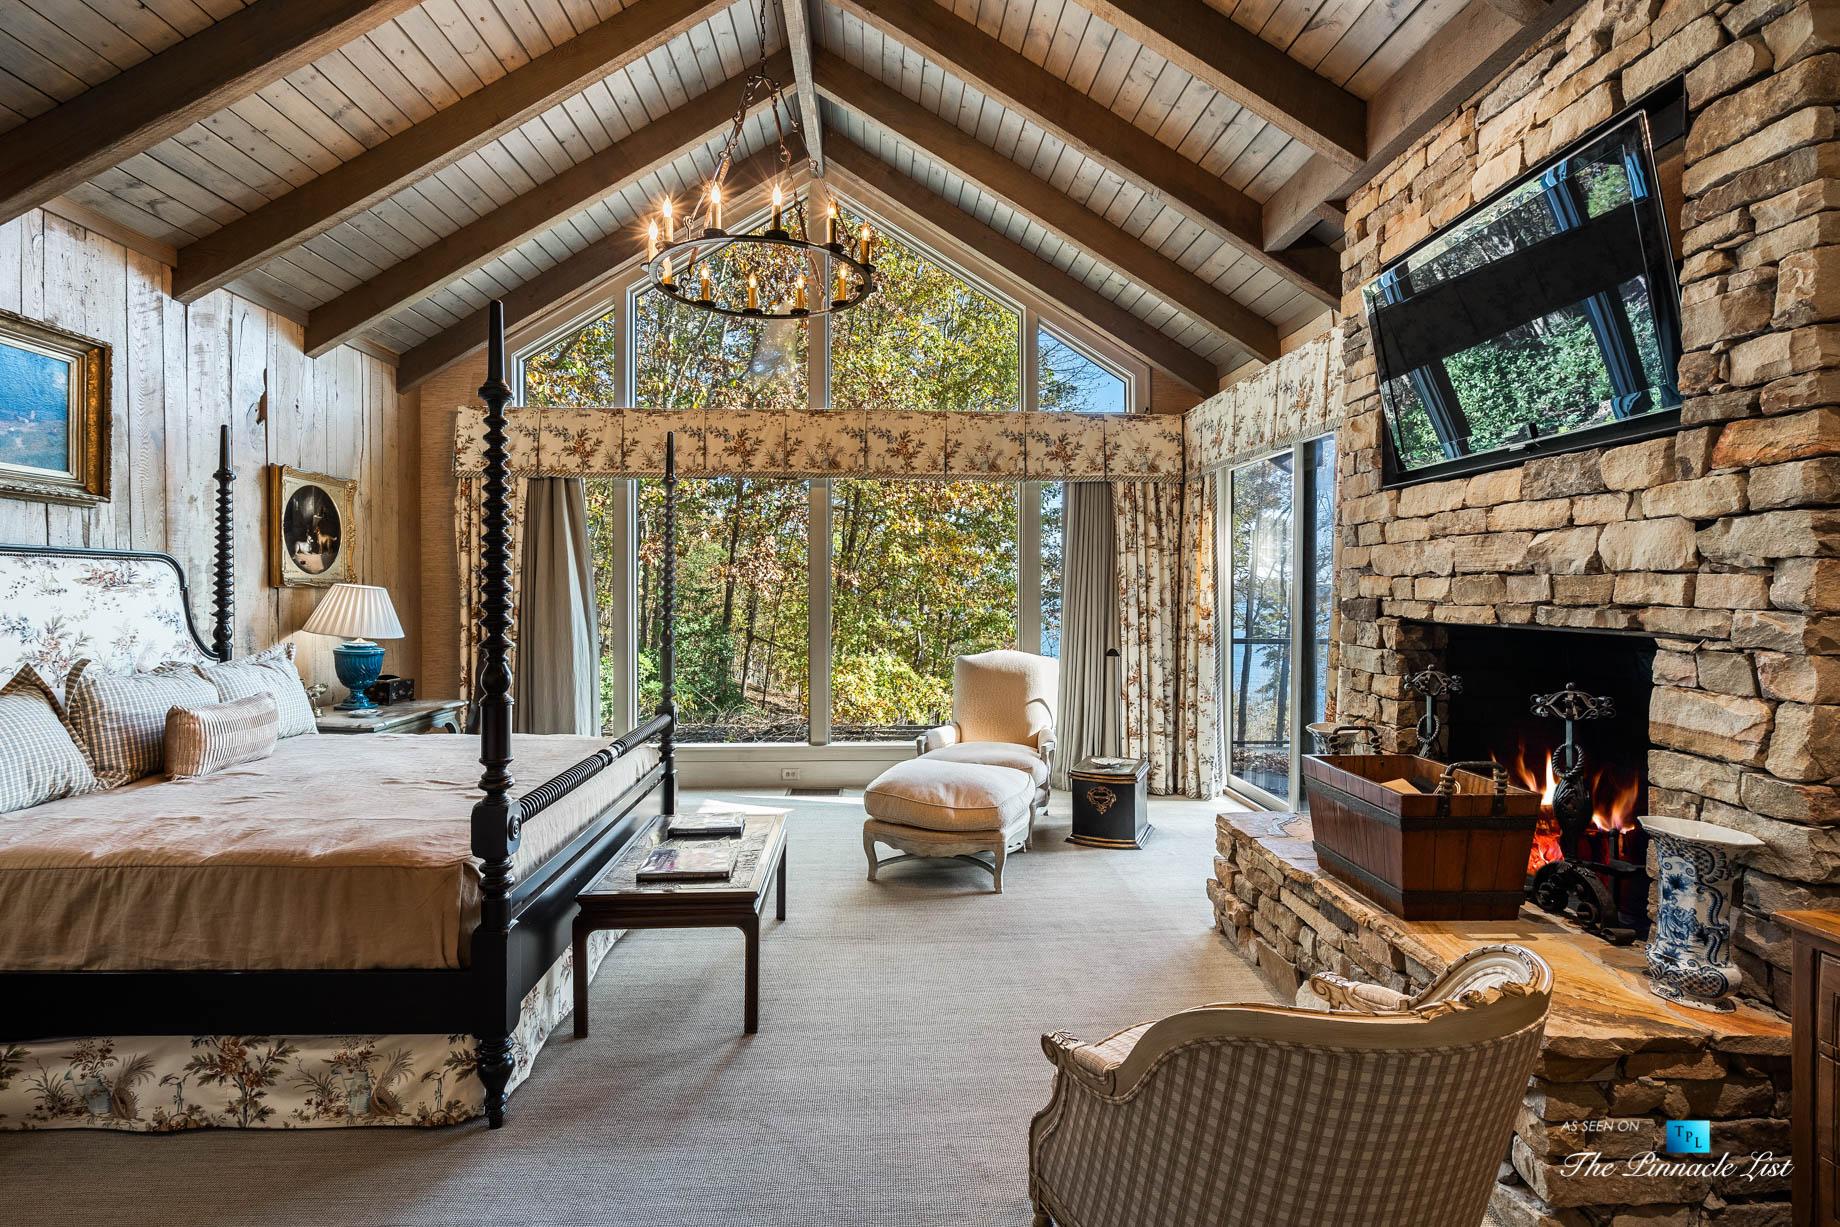 7860 Chestnut Hill Rd, Cumming, GA, USA - Master Bedroom - Luxury Real Estate - Lake Lanier Mid-Century Modern Stone Home